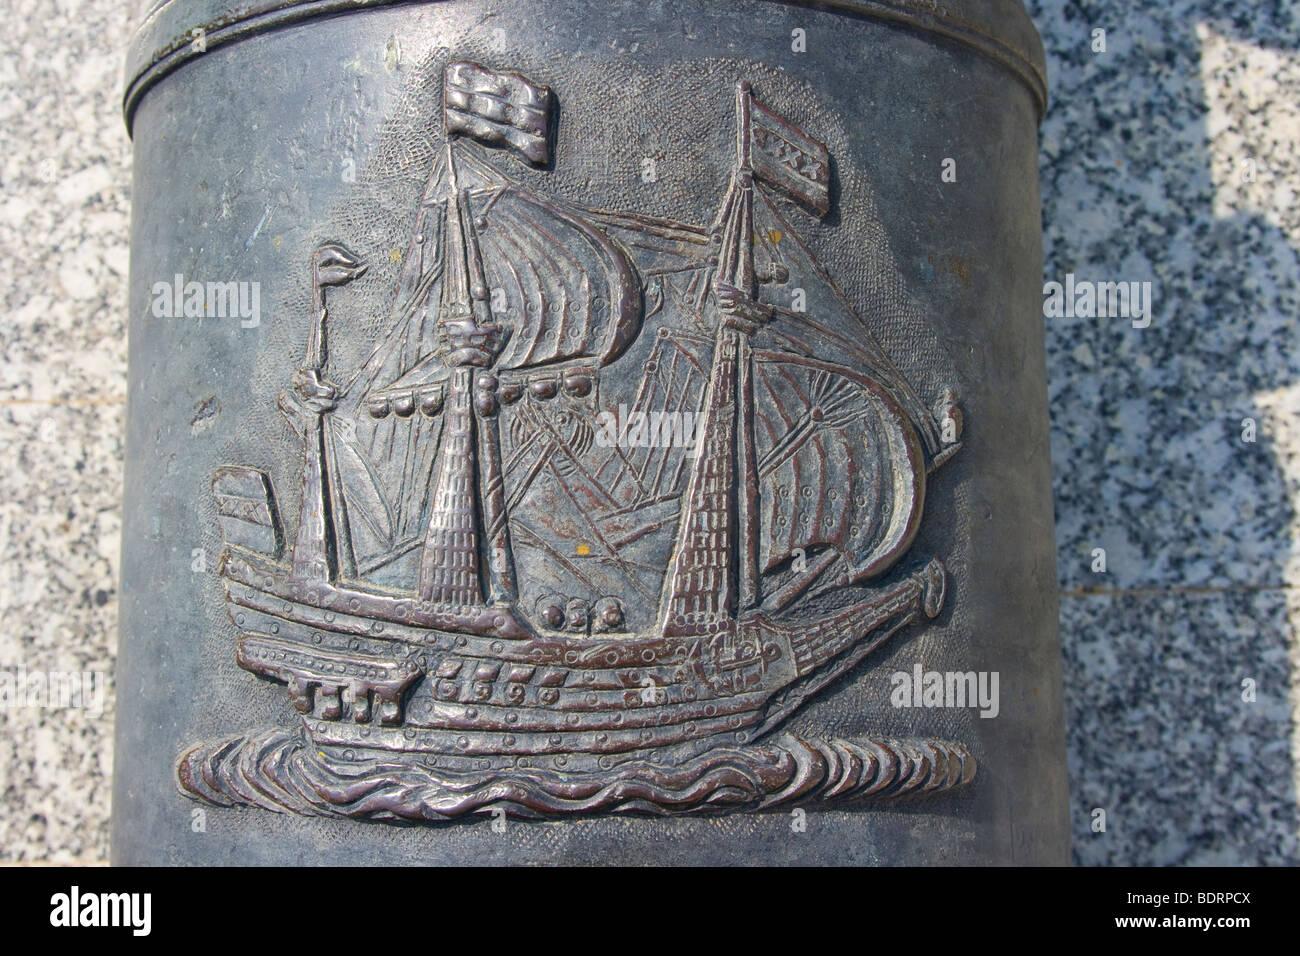 Cannon at Devagiri Fort in Daulatabad near Aurangabad India - Stock Image